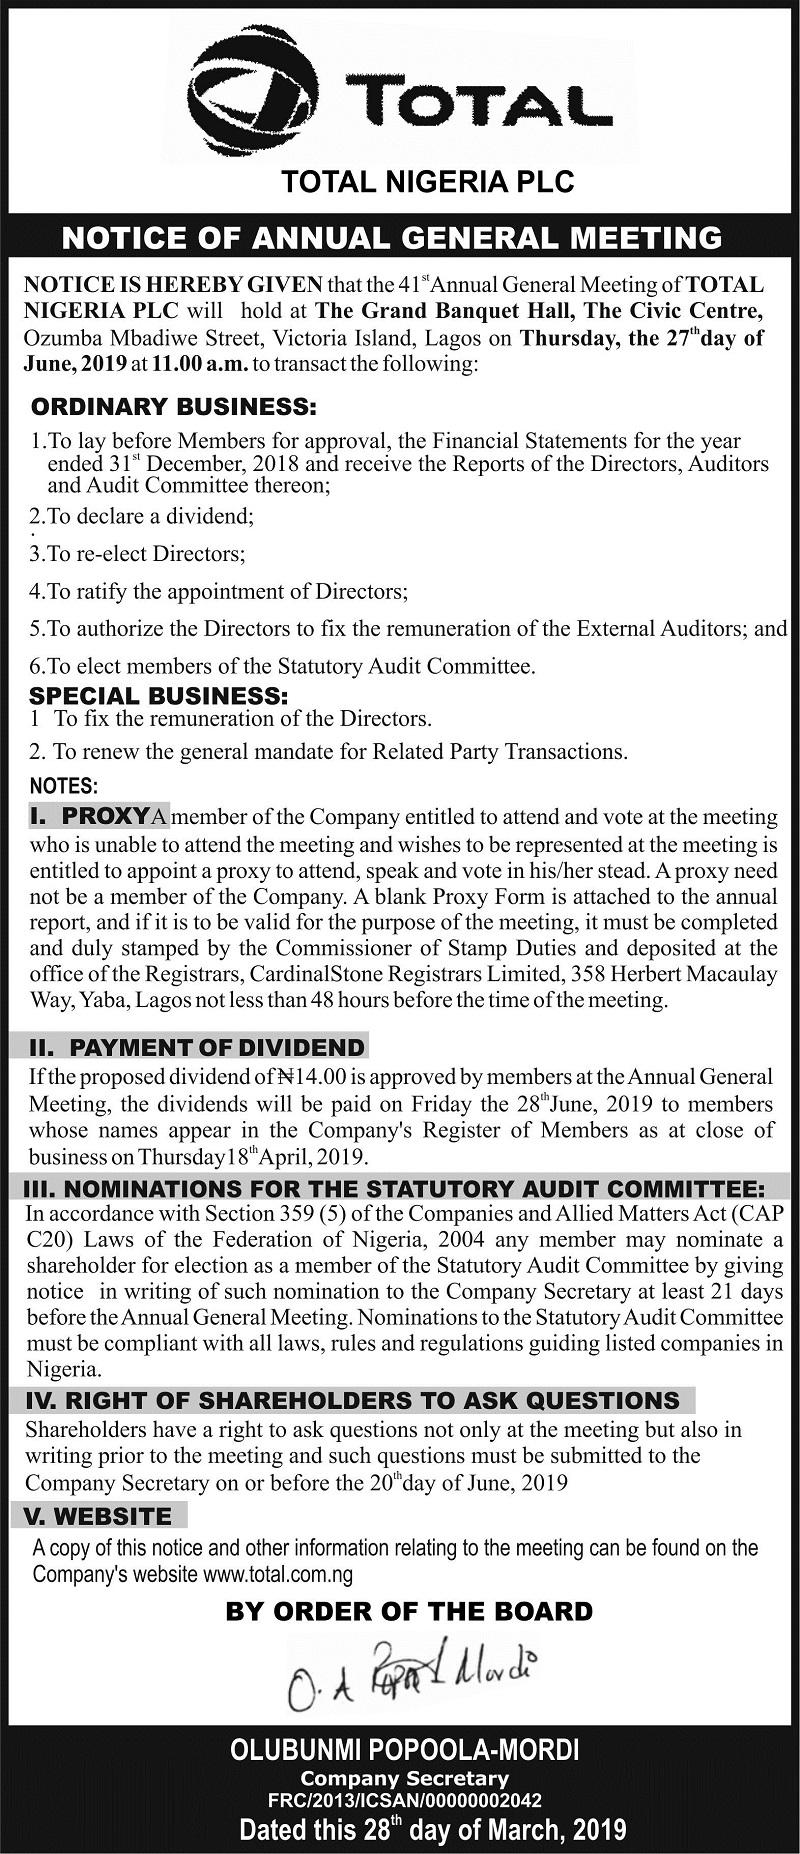 Total Nigeria Plc 41st AGM